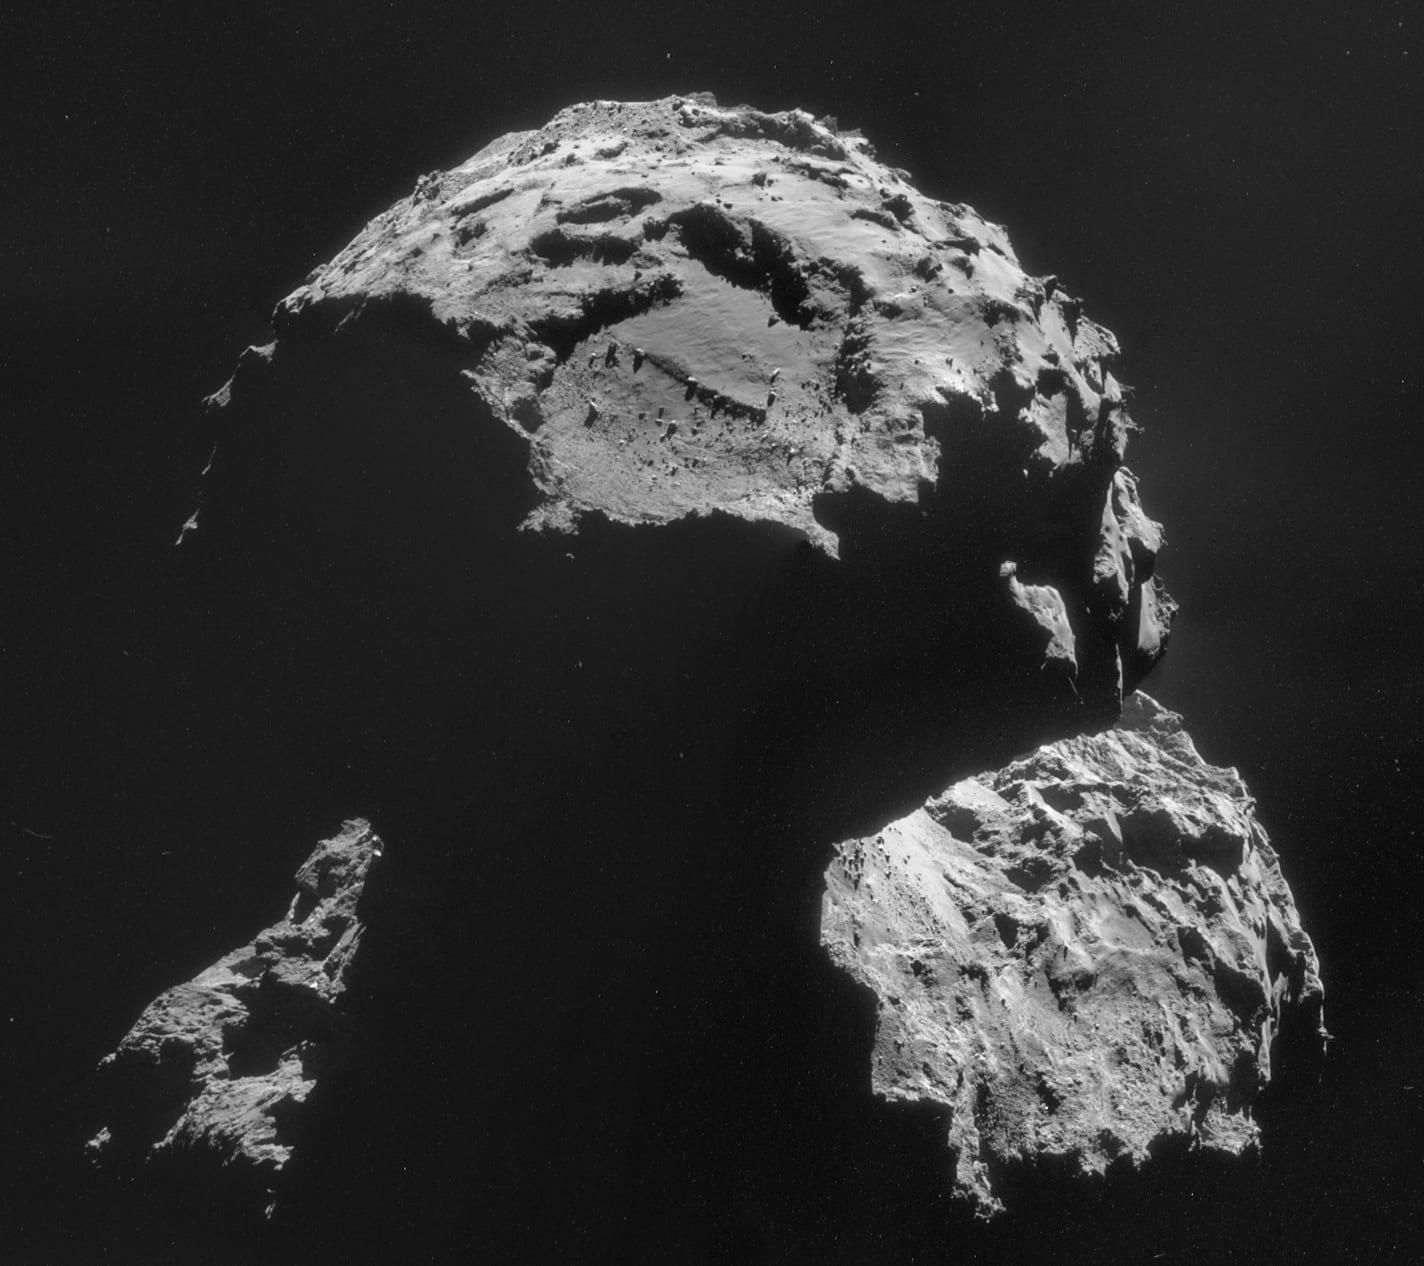 Rosetta | UCL Science blog